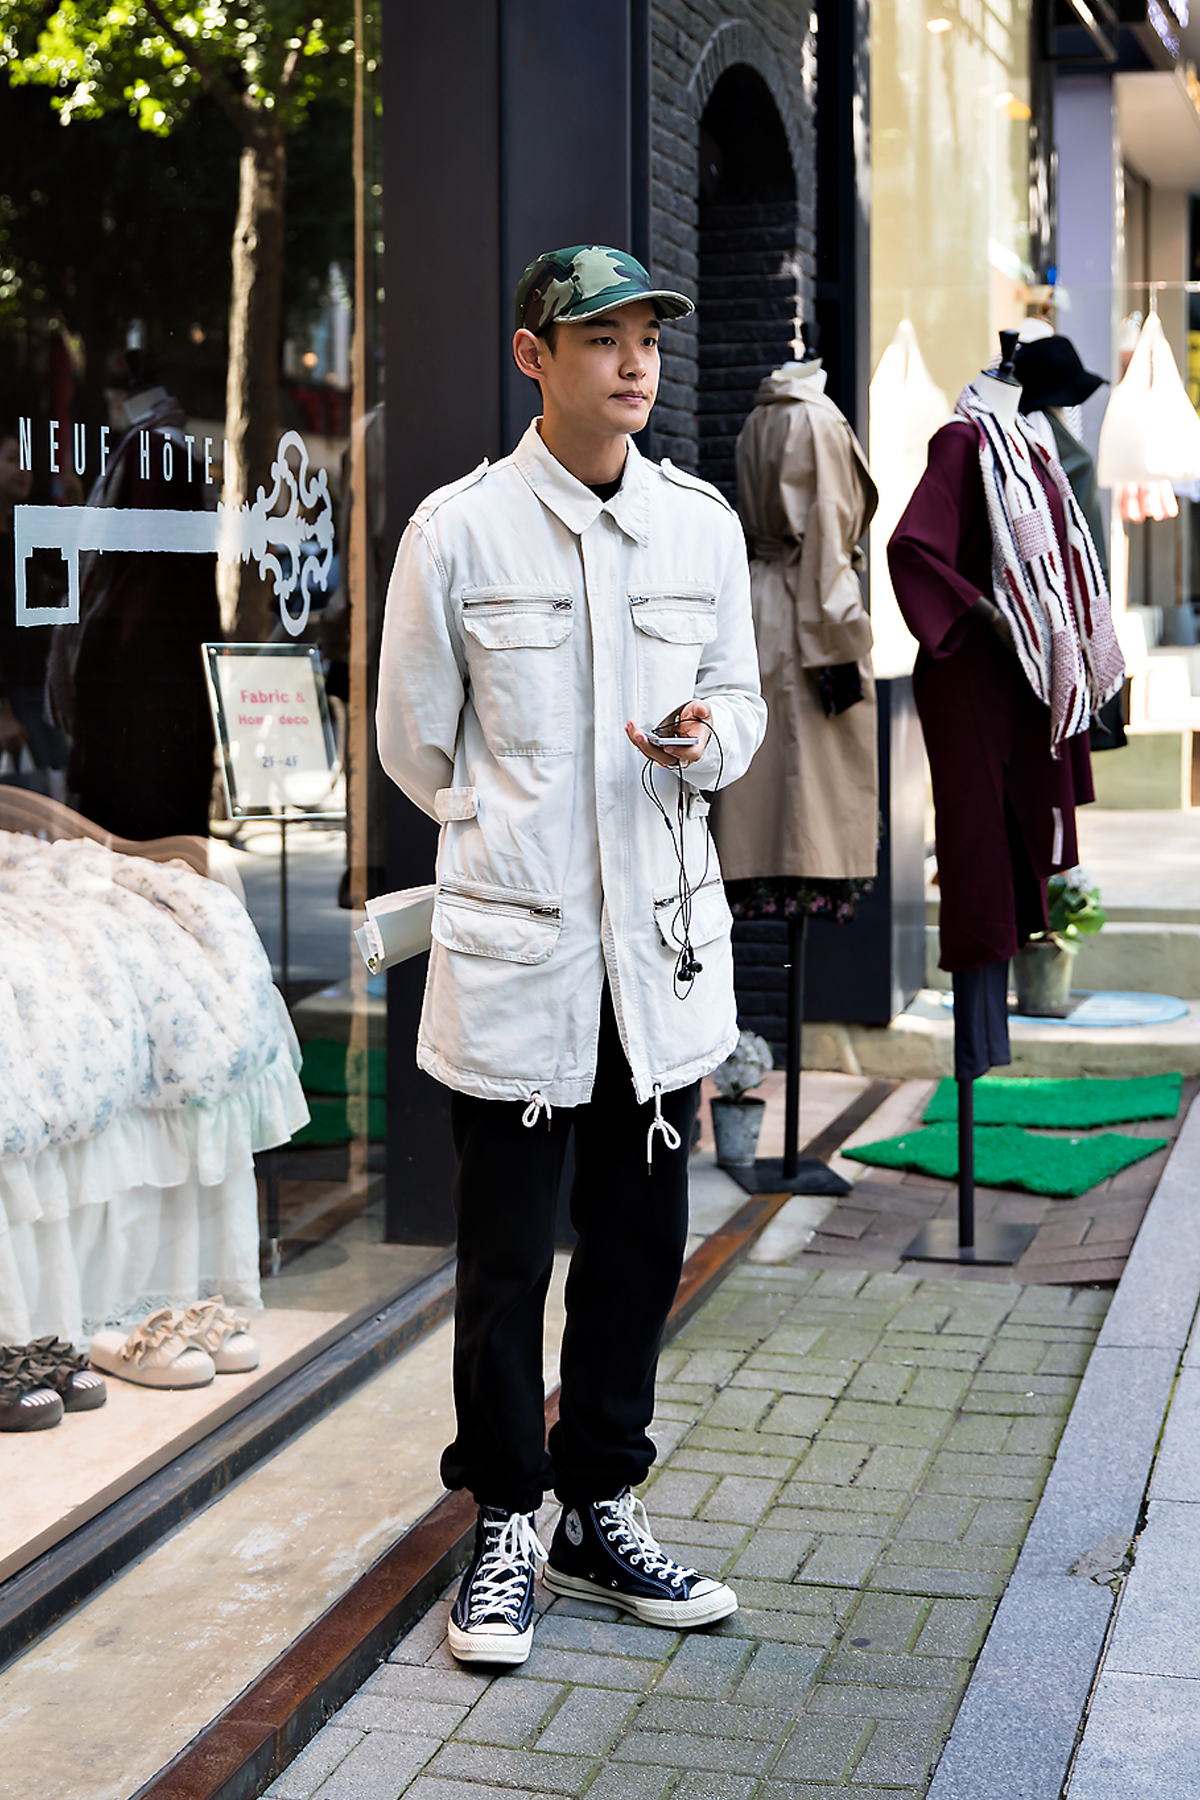 Kenpyun, Street Fashion 2017 in Seoul.jpg